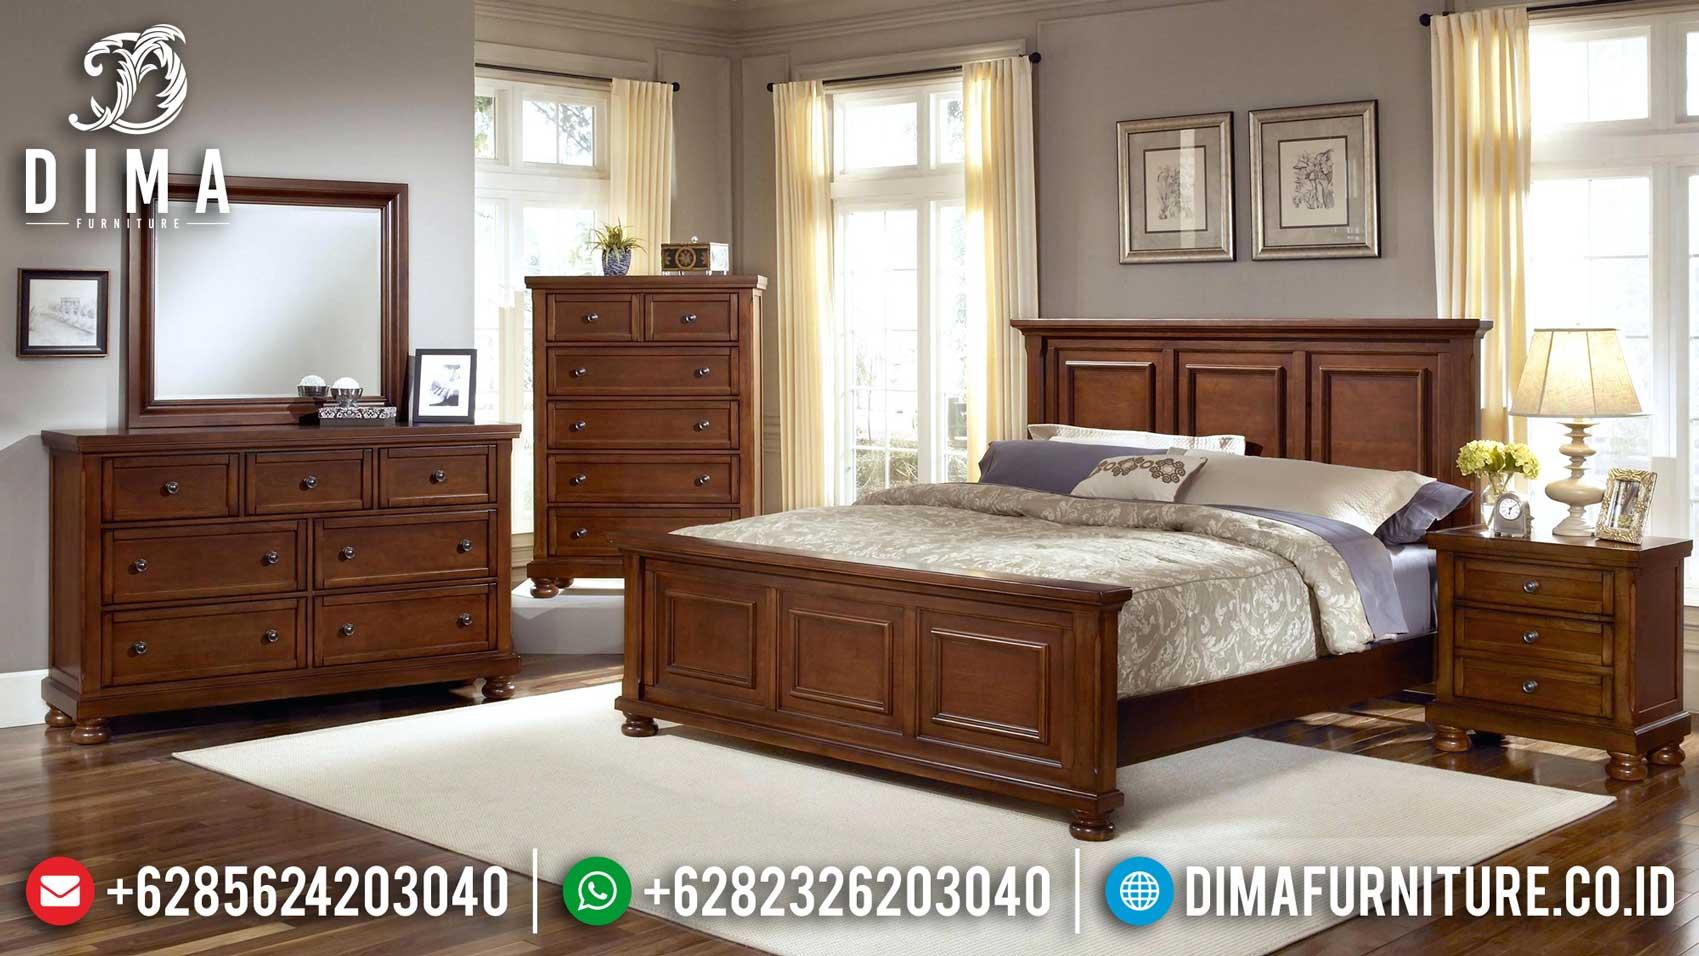 Fransisca Design Tempat Tidur Minimalis Jati Natural Auburn Classic Luxurious TTJ-1129